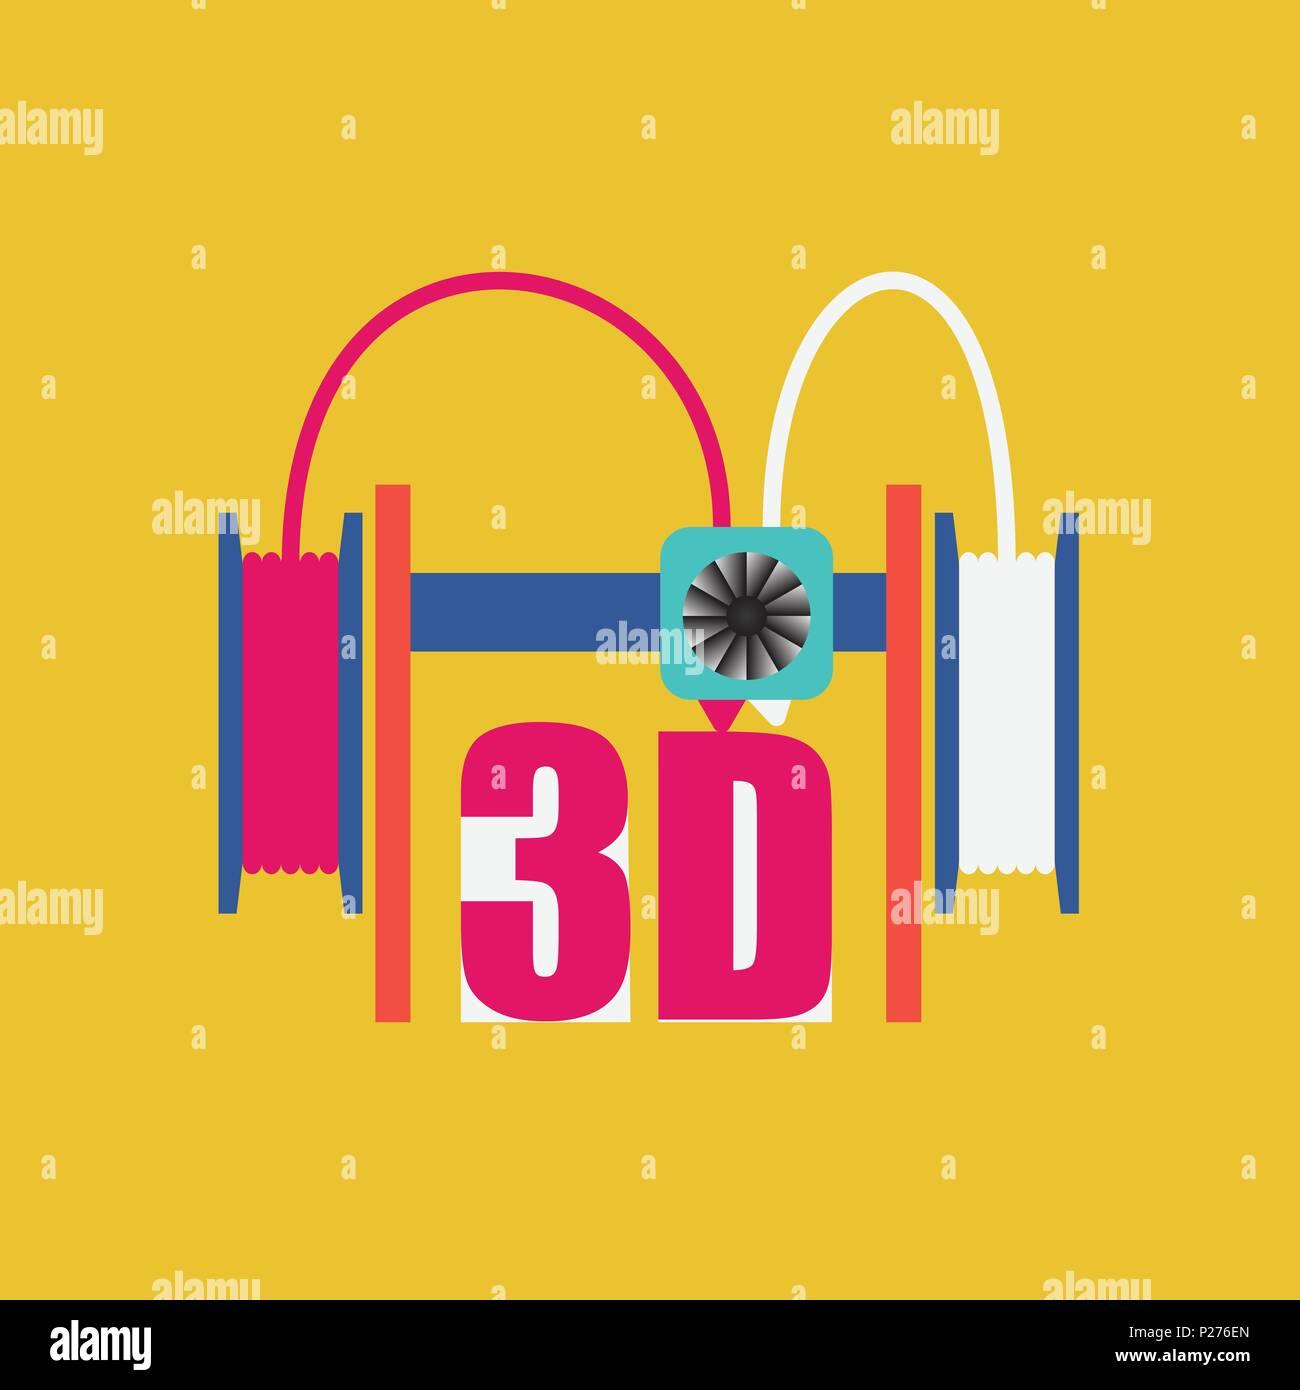 Dual extruder 3d printer. Vector illustration. Modern technology - Stock Vector